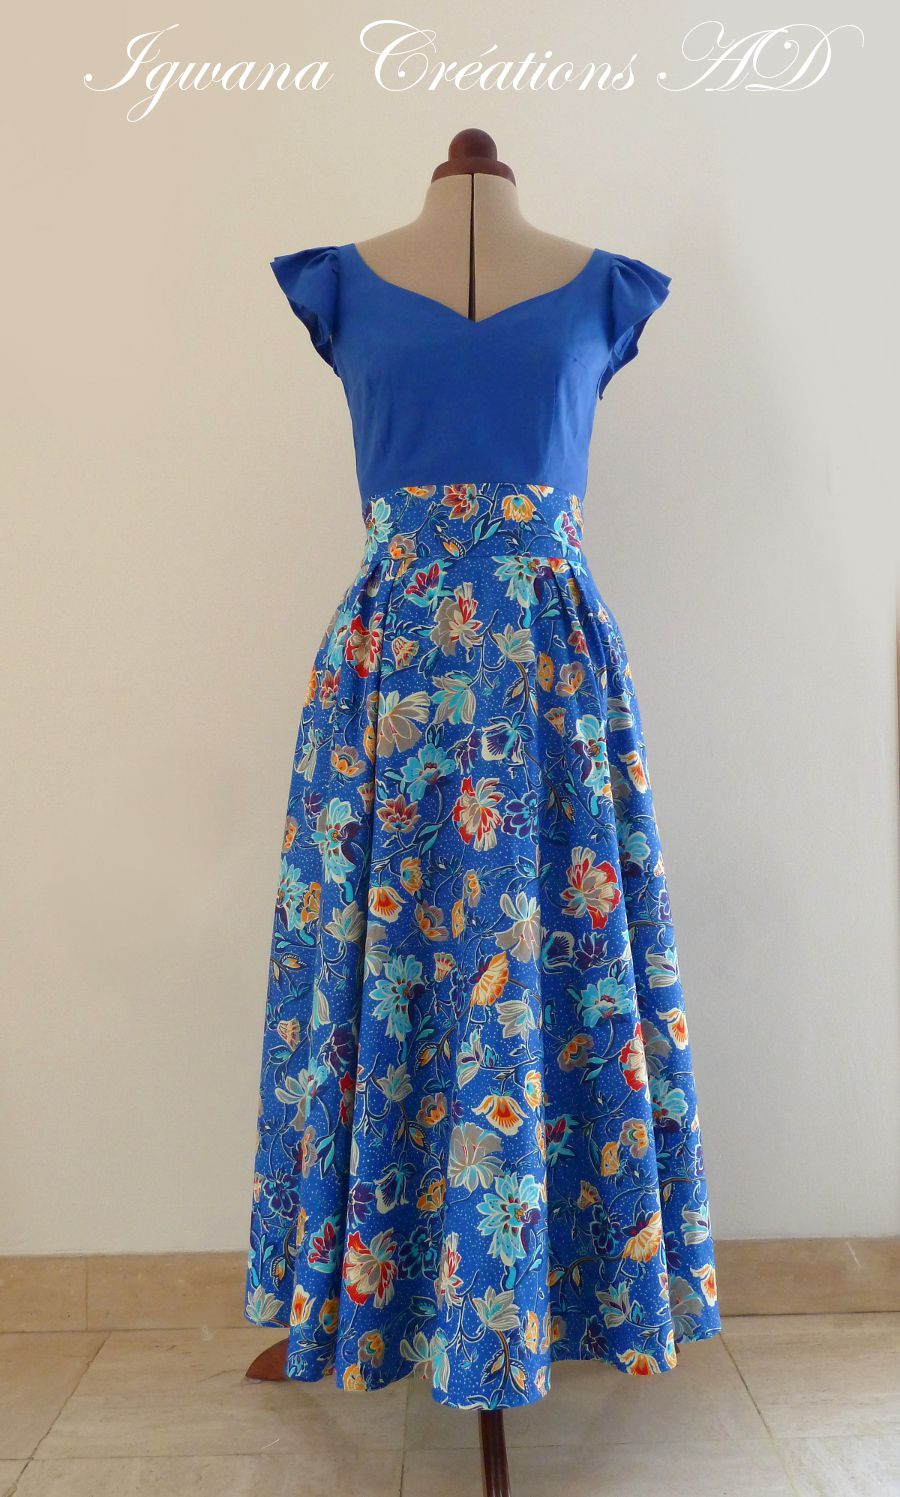 Robes de printemps...autres variantes